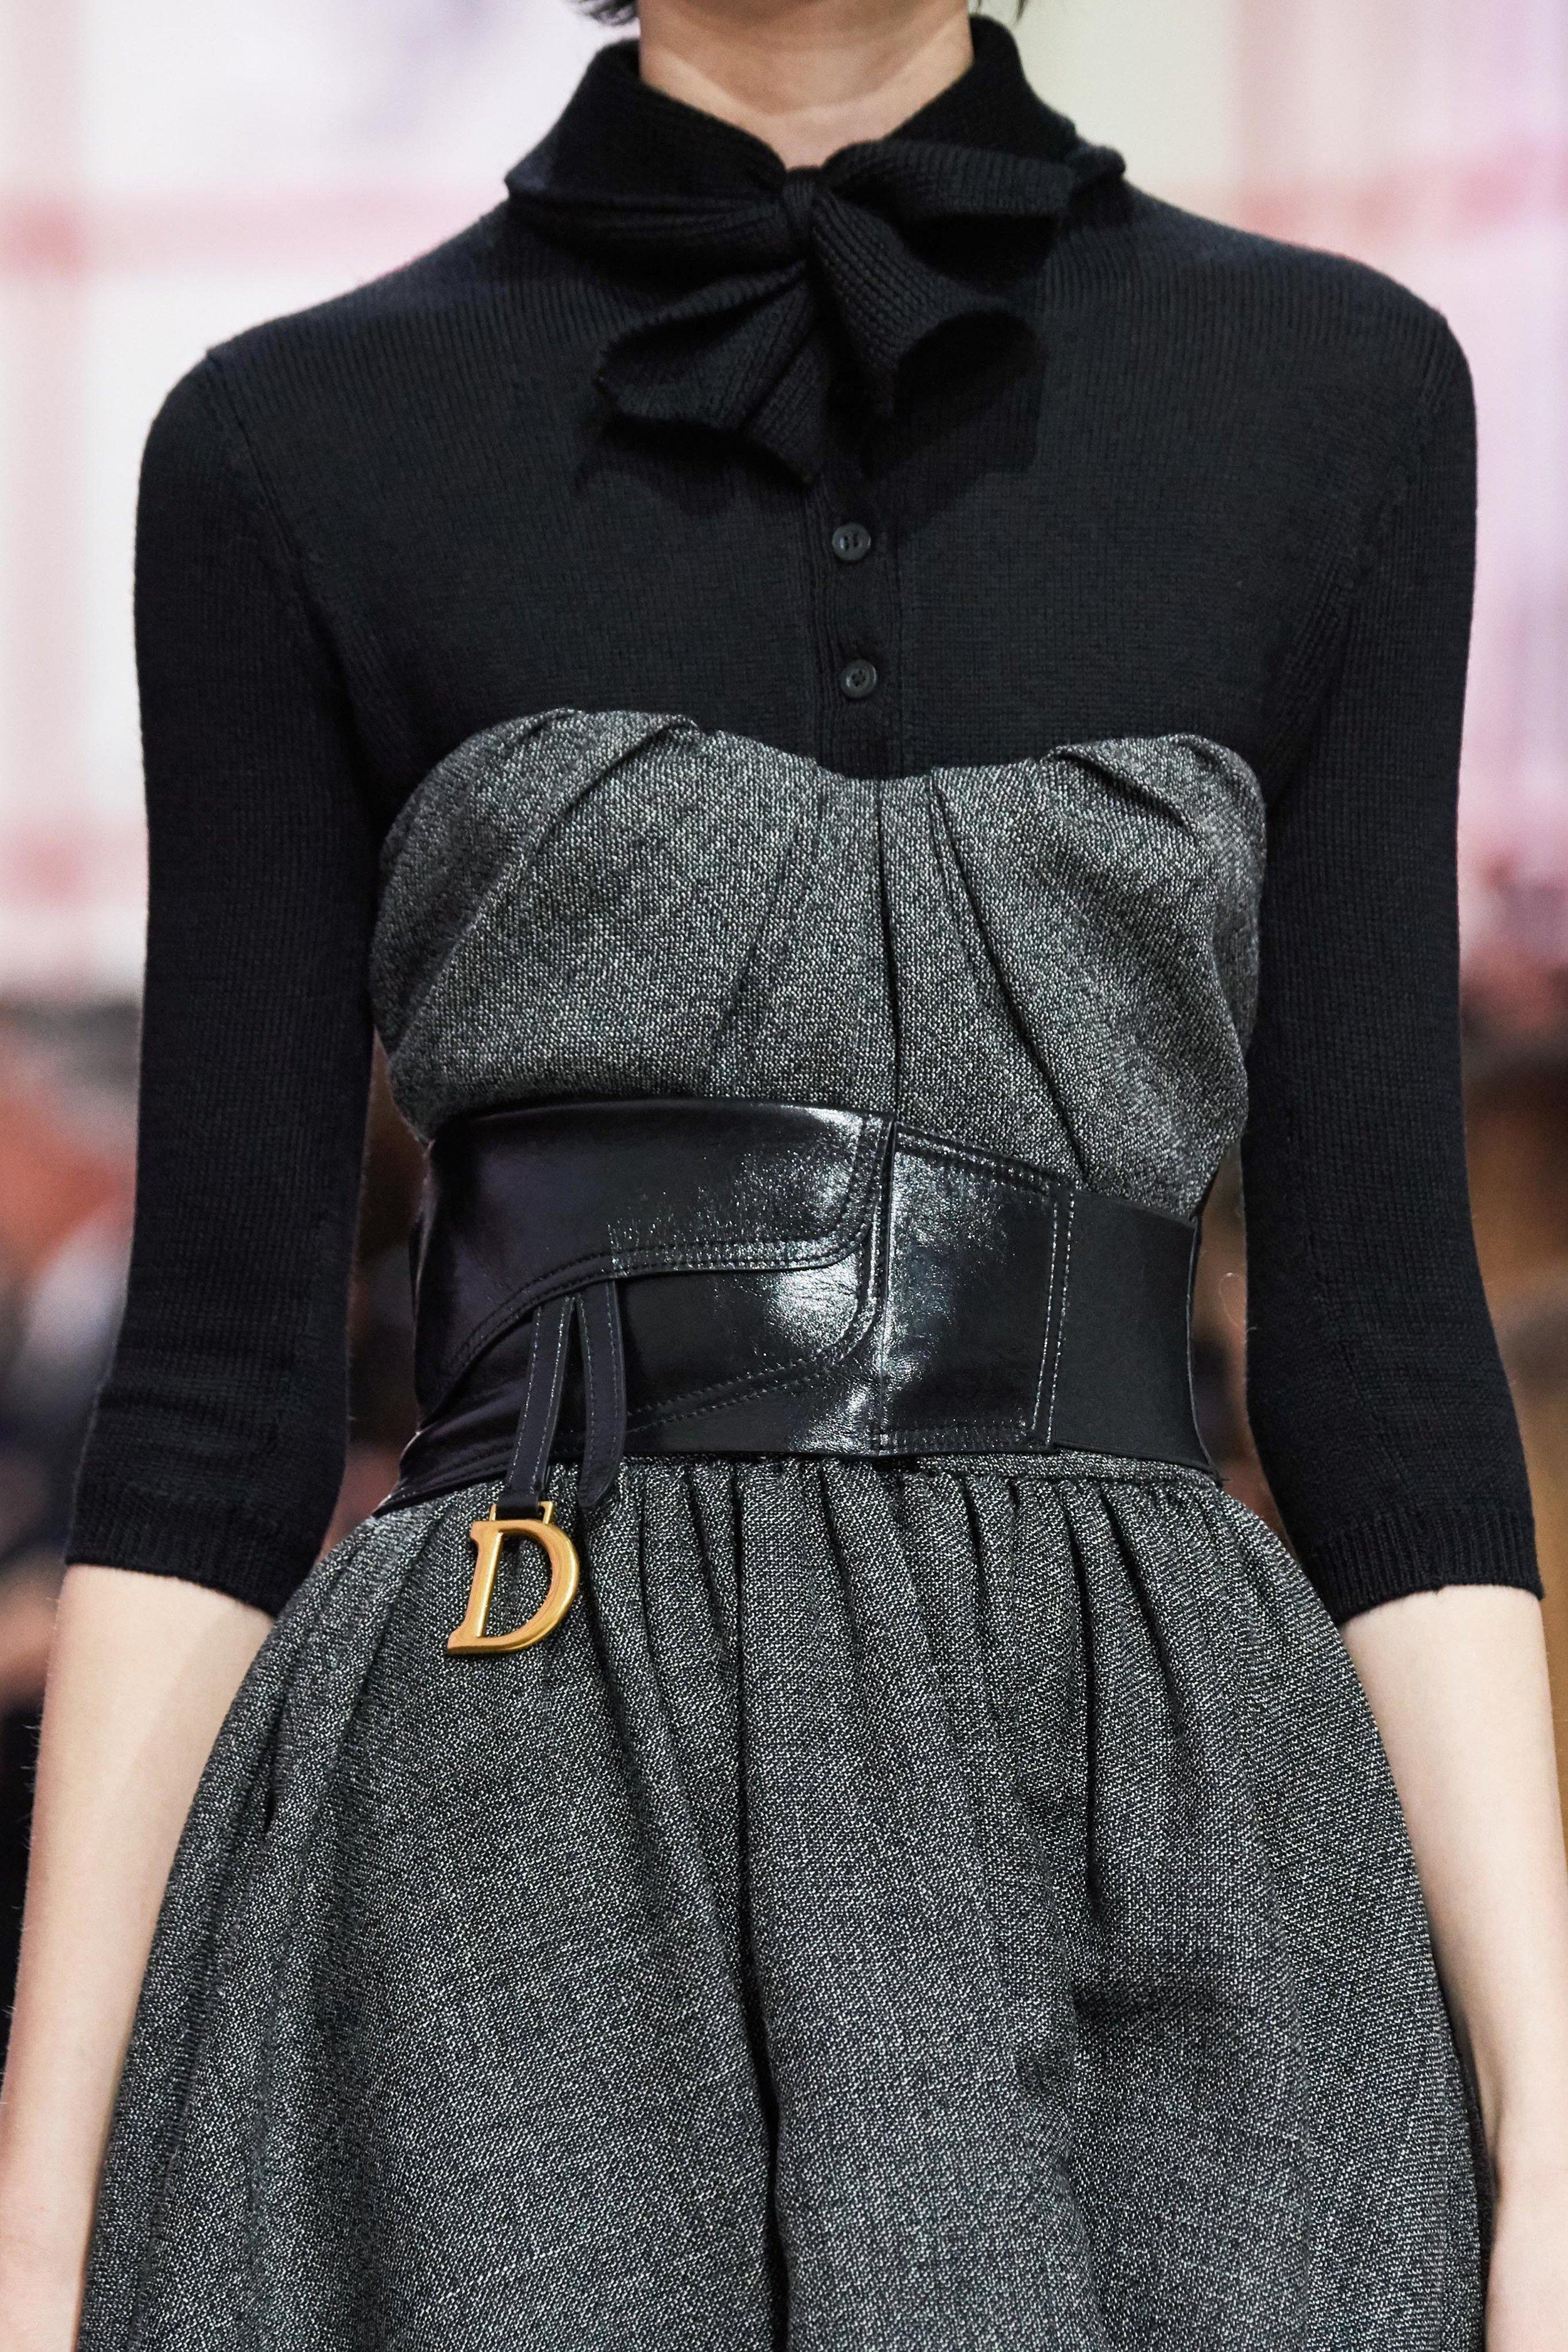 PFW 2019 -Dior